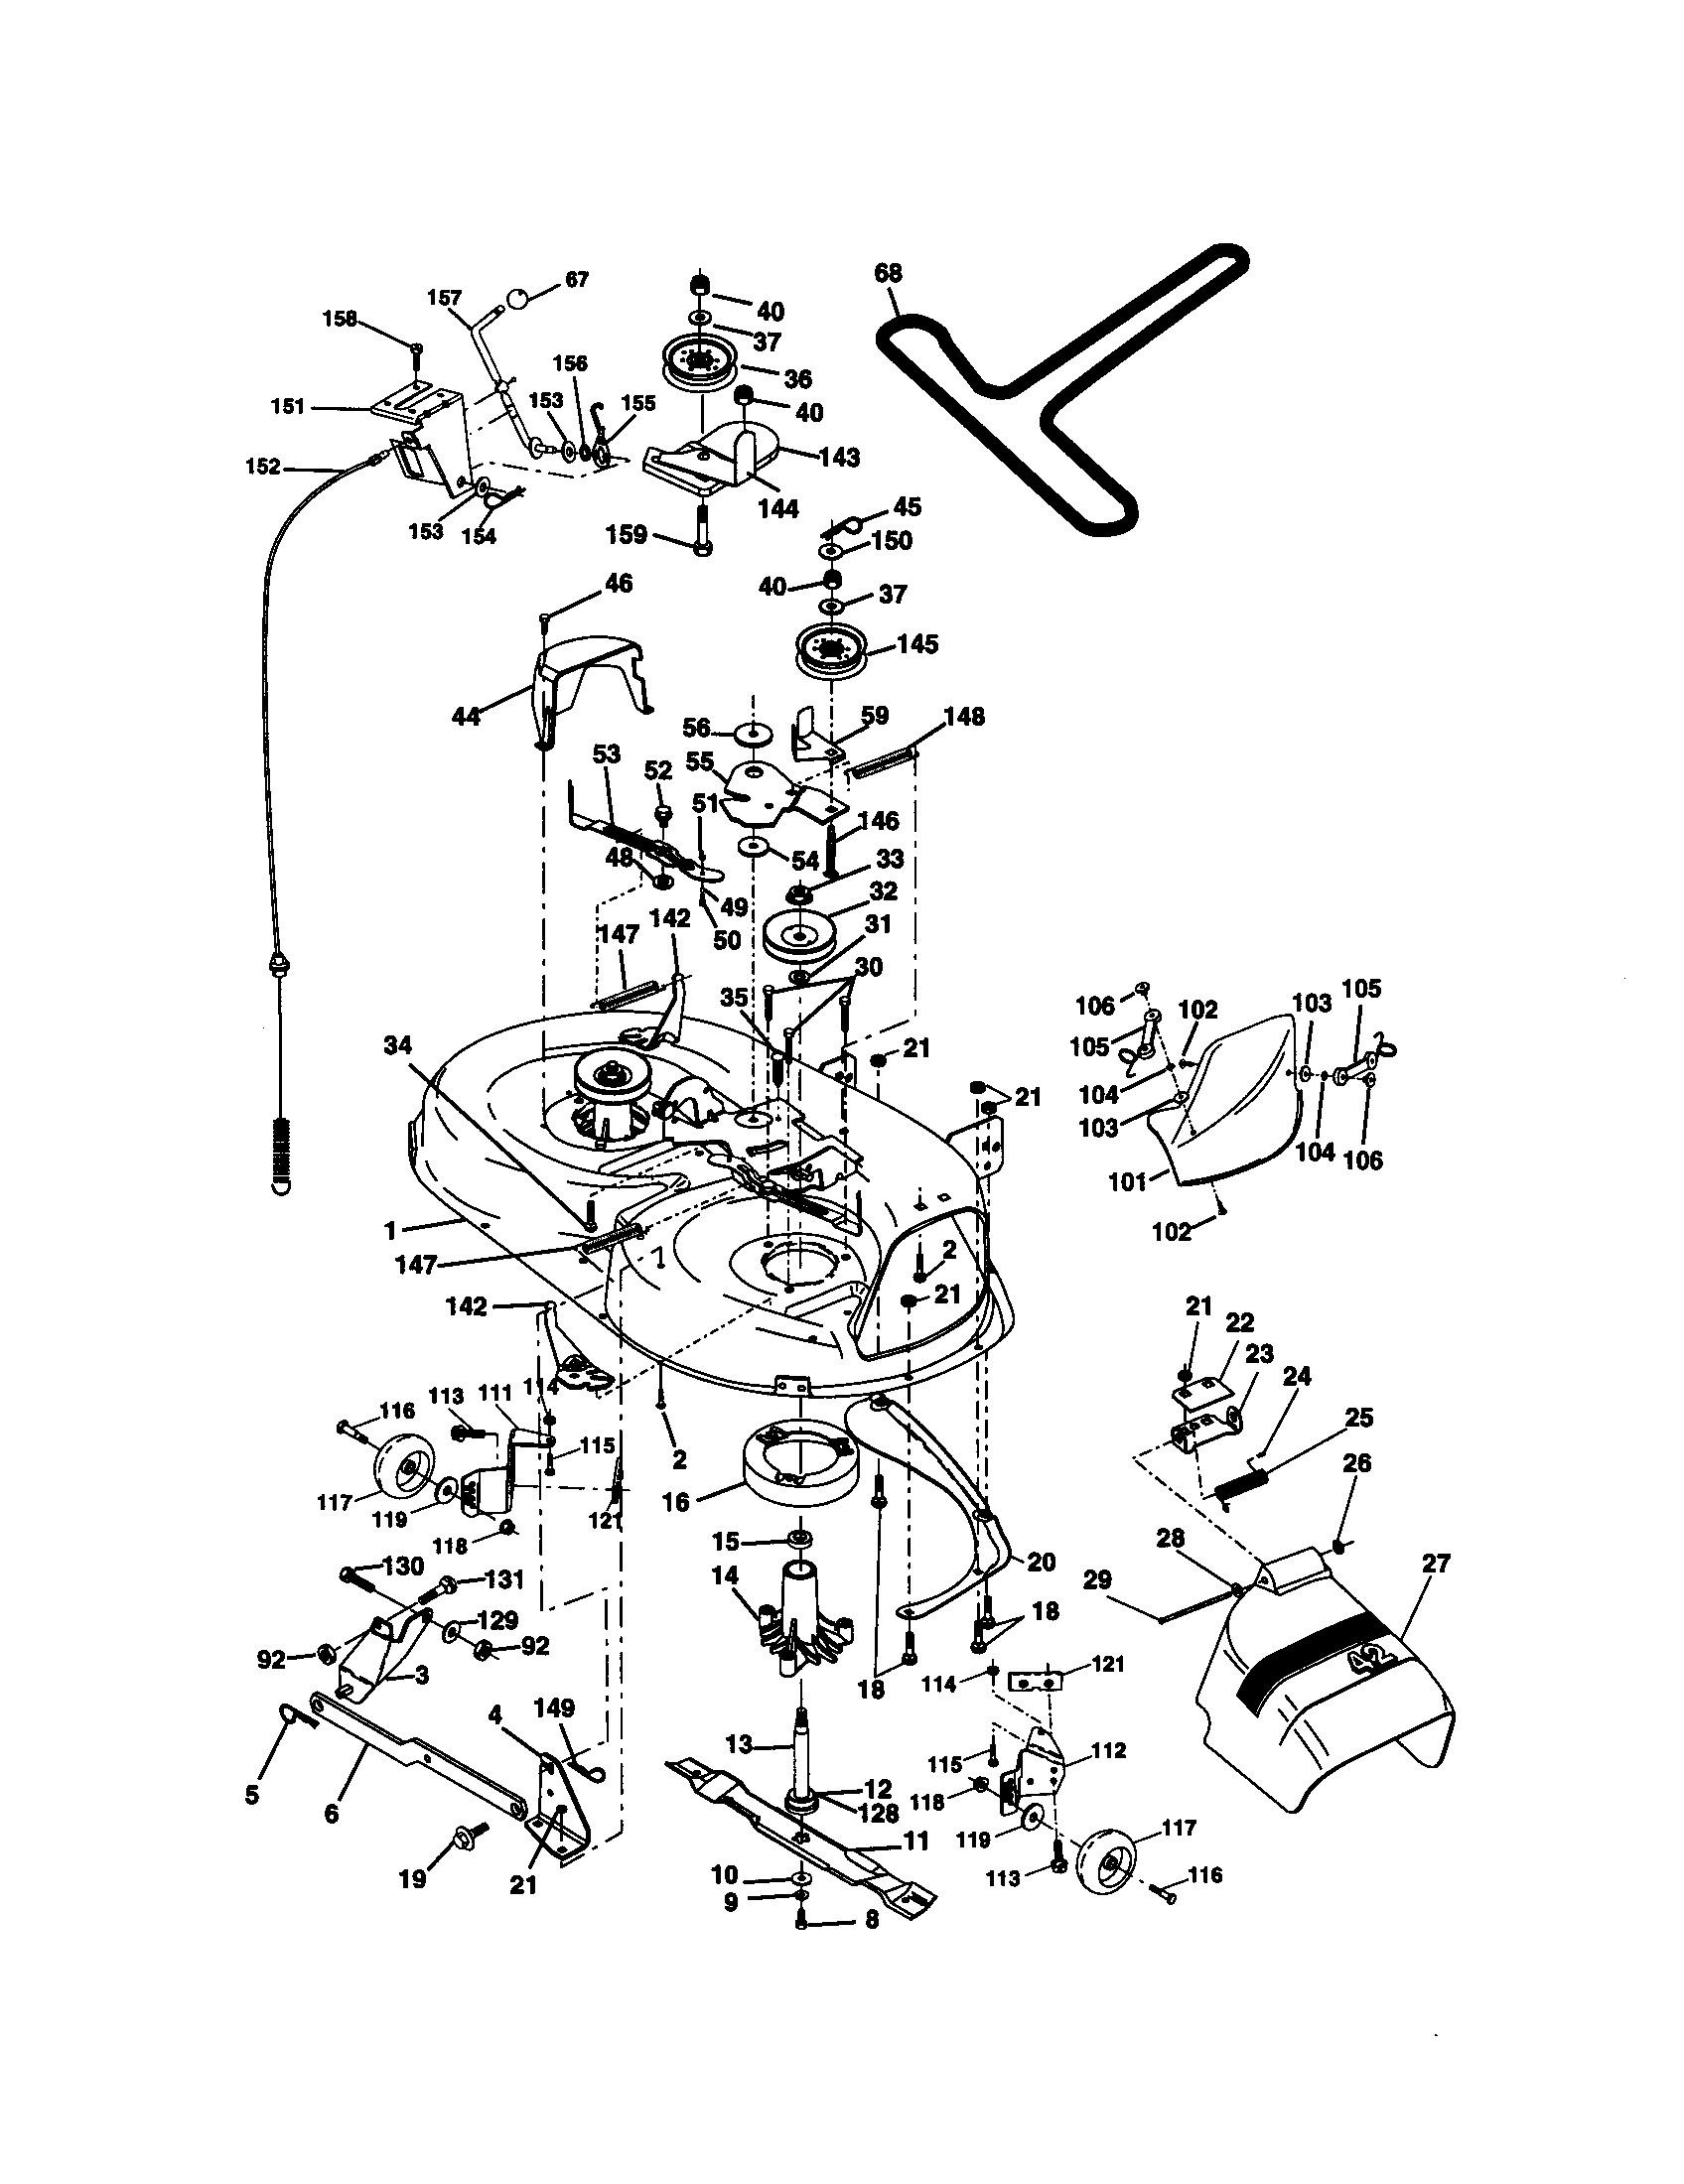 Diagram of lawn mower engine craftsman model lawn tractor genuine parts of diagram of lawn mower